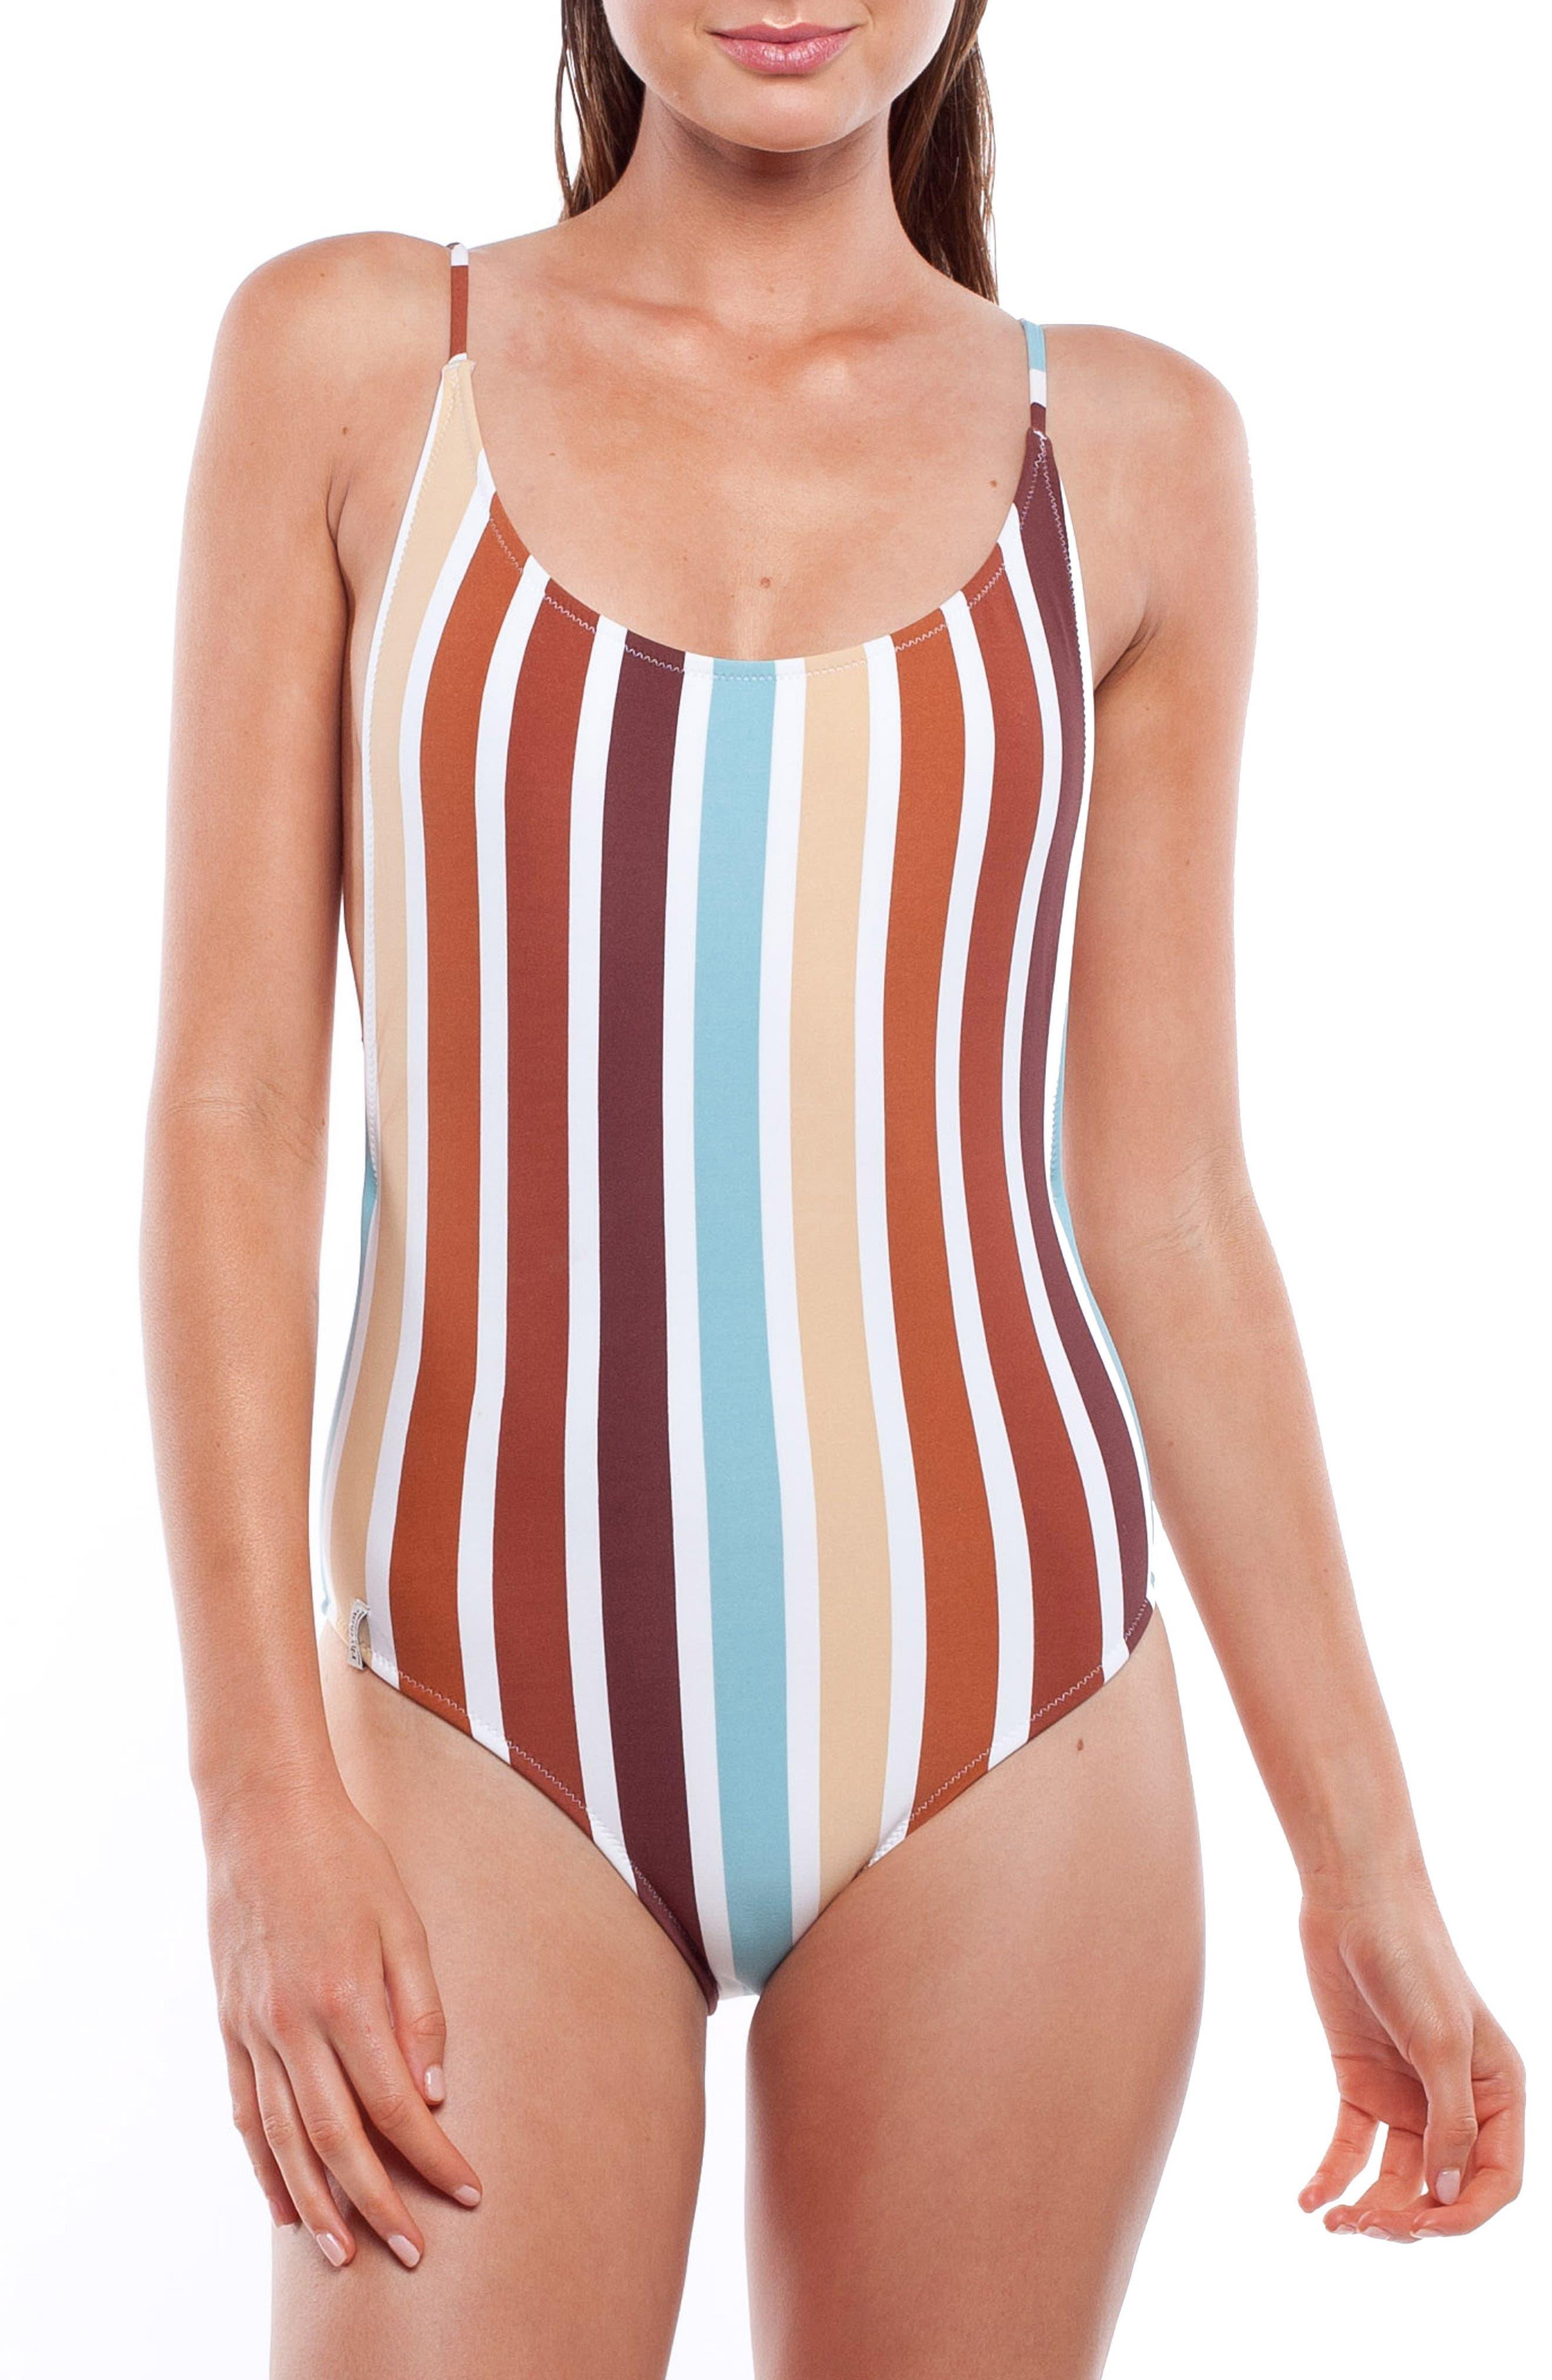 60s Swimsuits, 70s Bathing Suits | Retro Swimwear Womens Rhythm Stripe One-Piece Swimsuit $80.00 AT vintagedancer.com